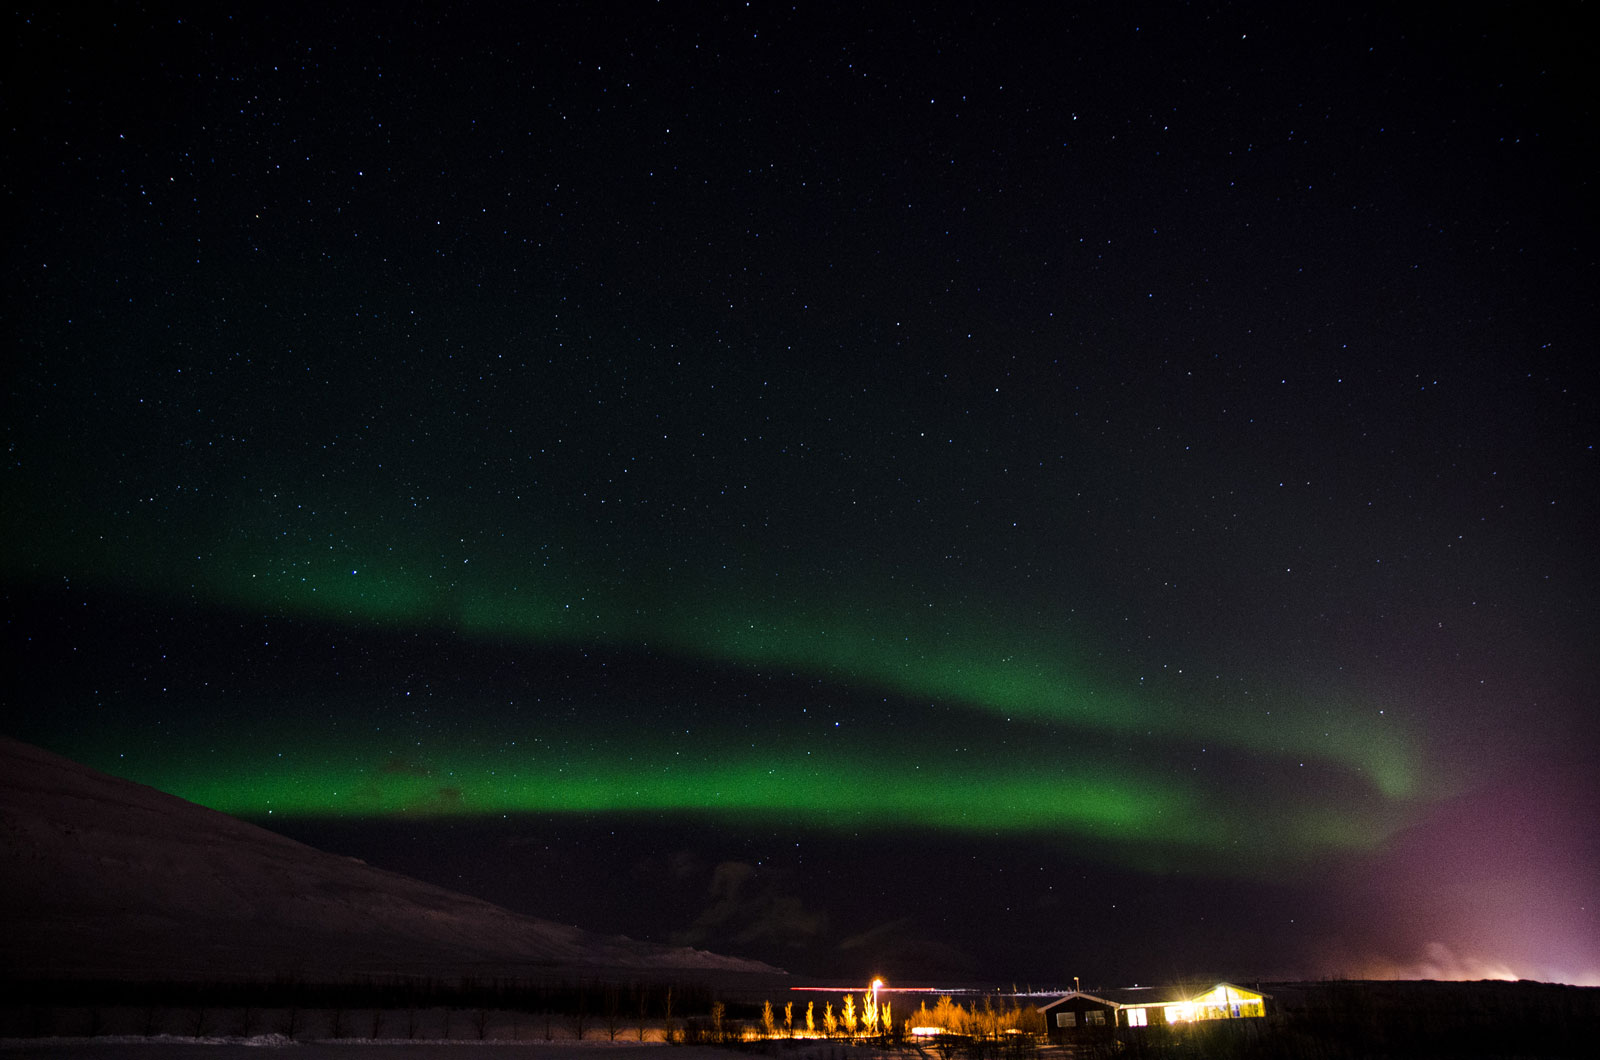 The Northen Lights